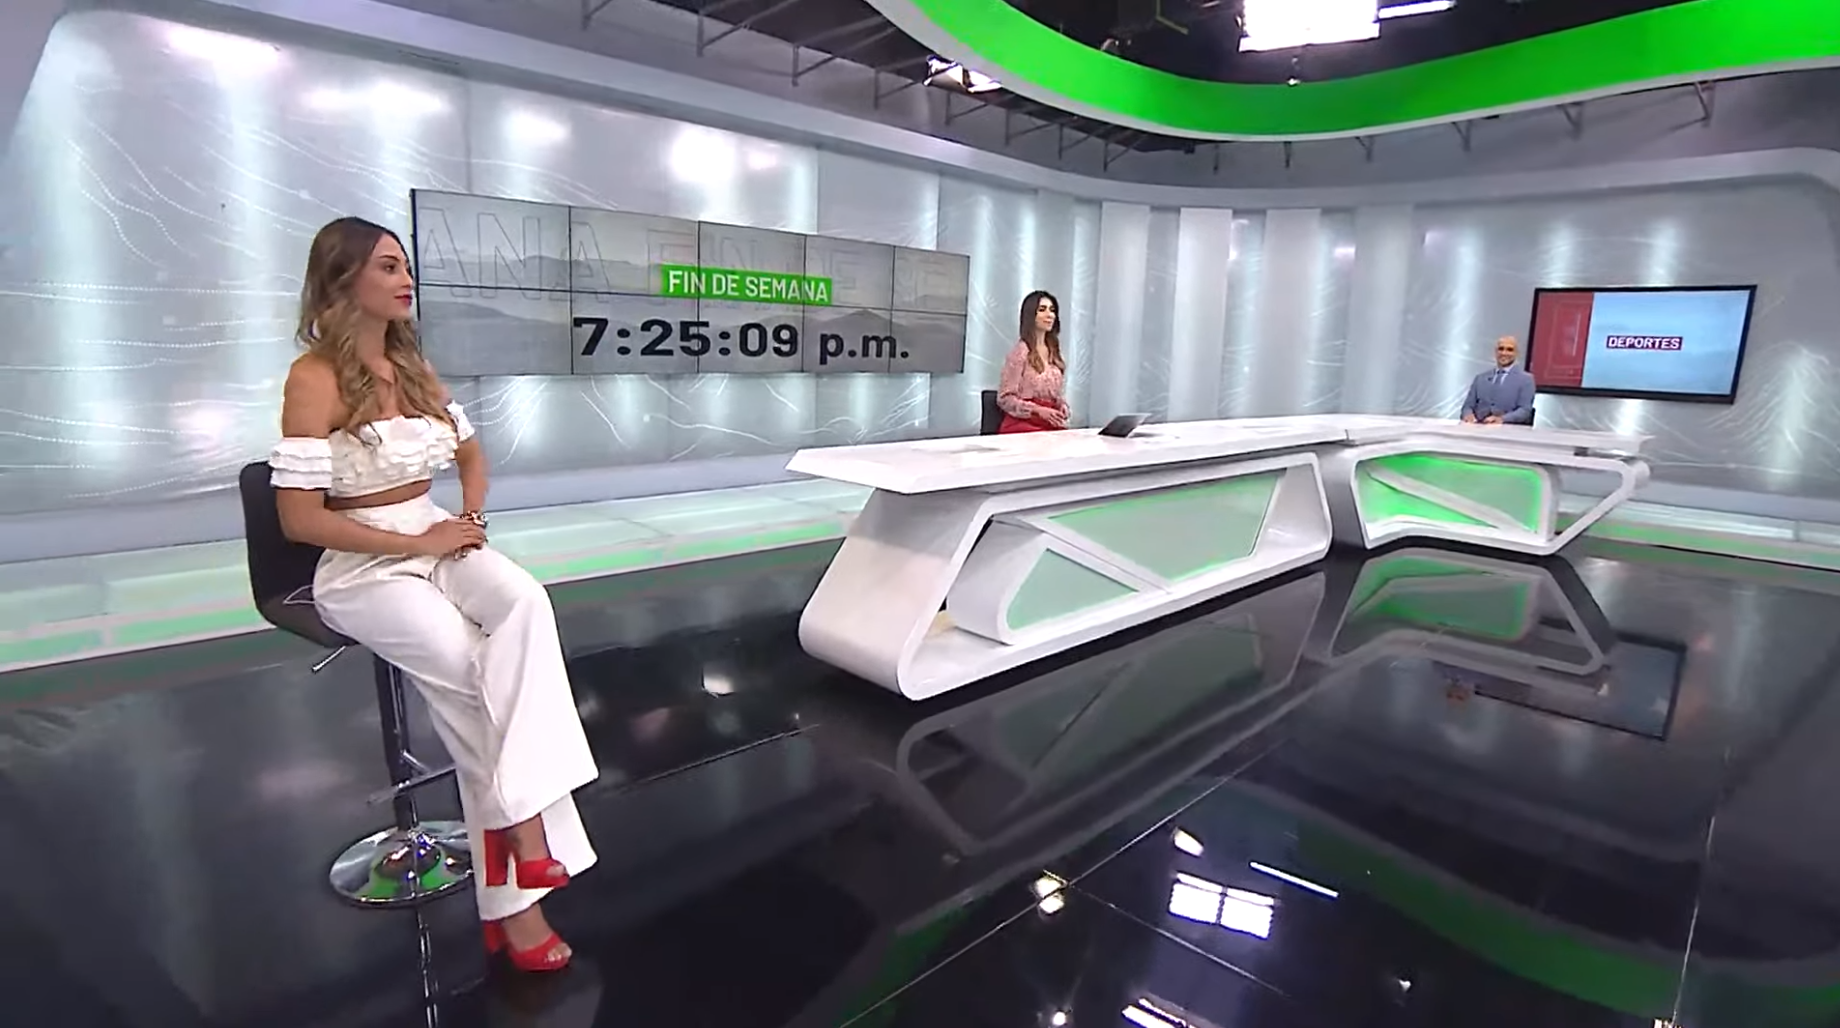 Teleantioquia Noticias - domingo 11 de abril de 2021 noche